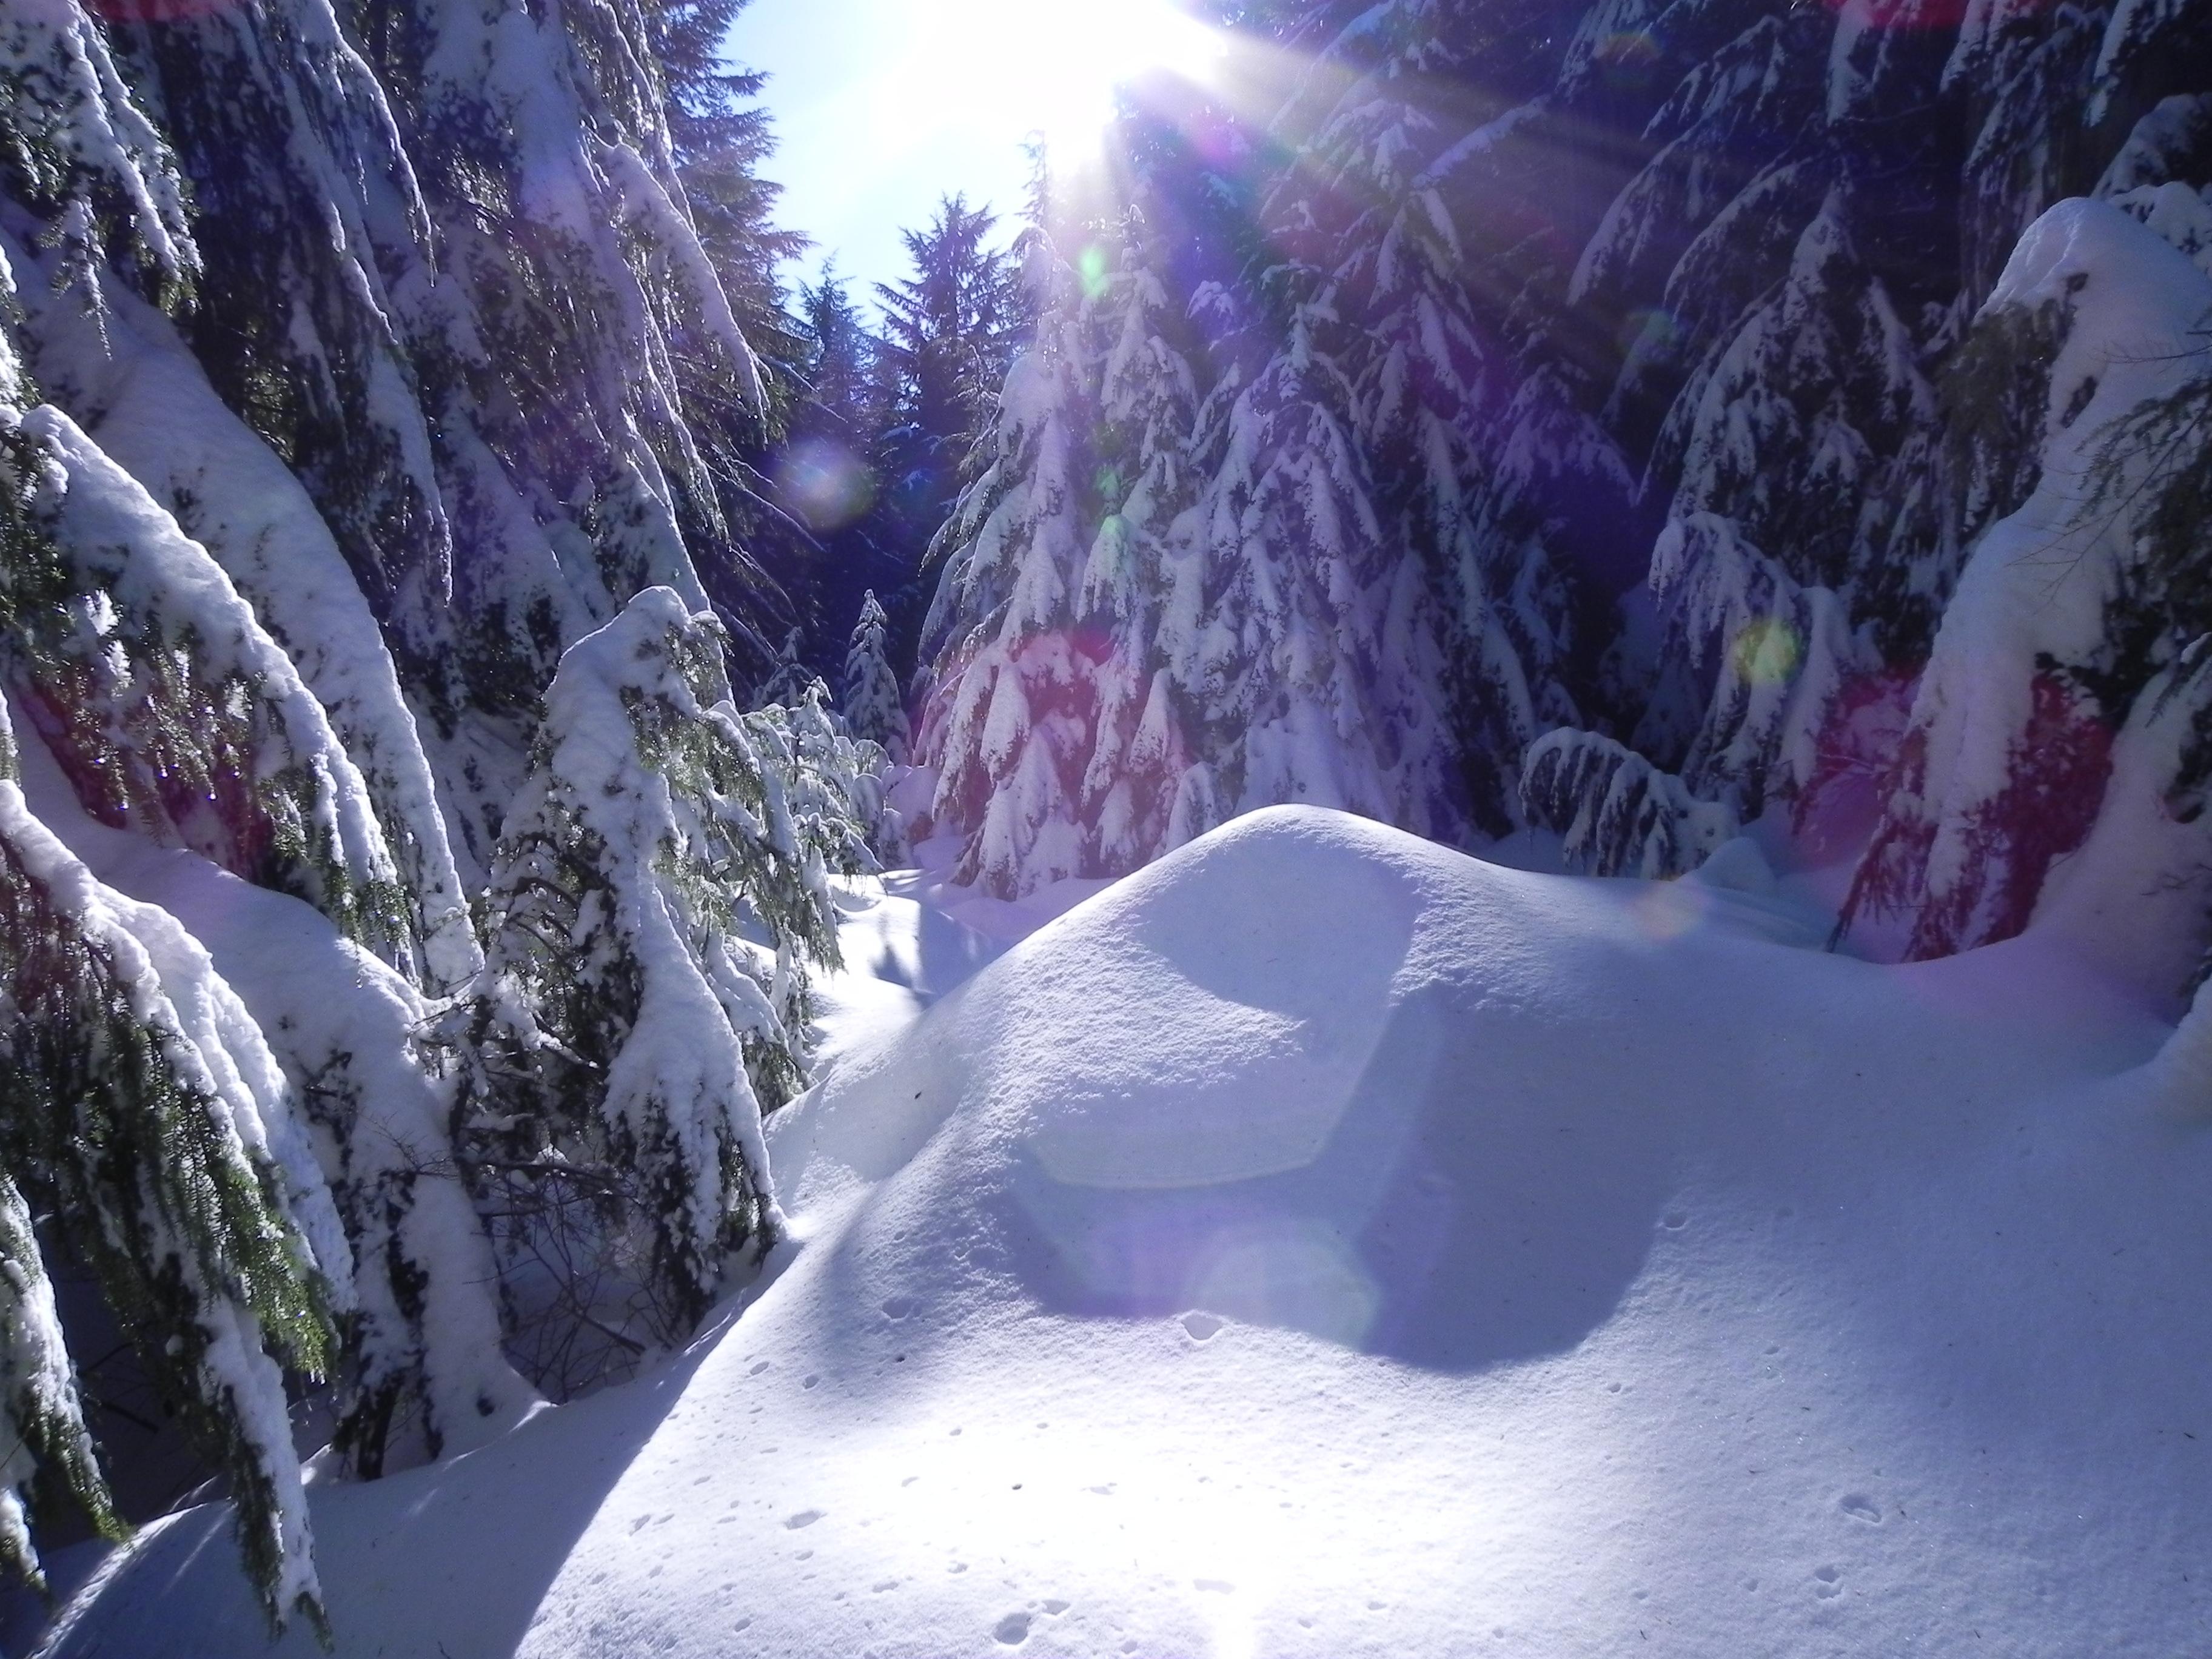 Sunshine on fresh snow